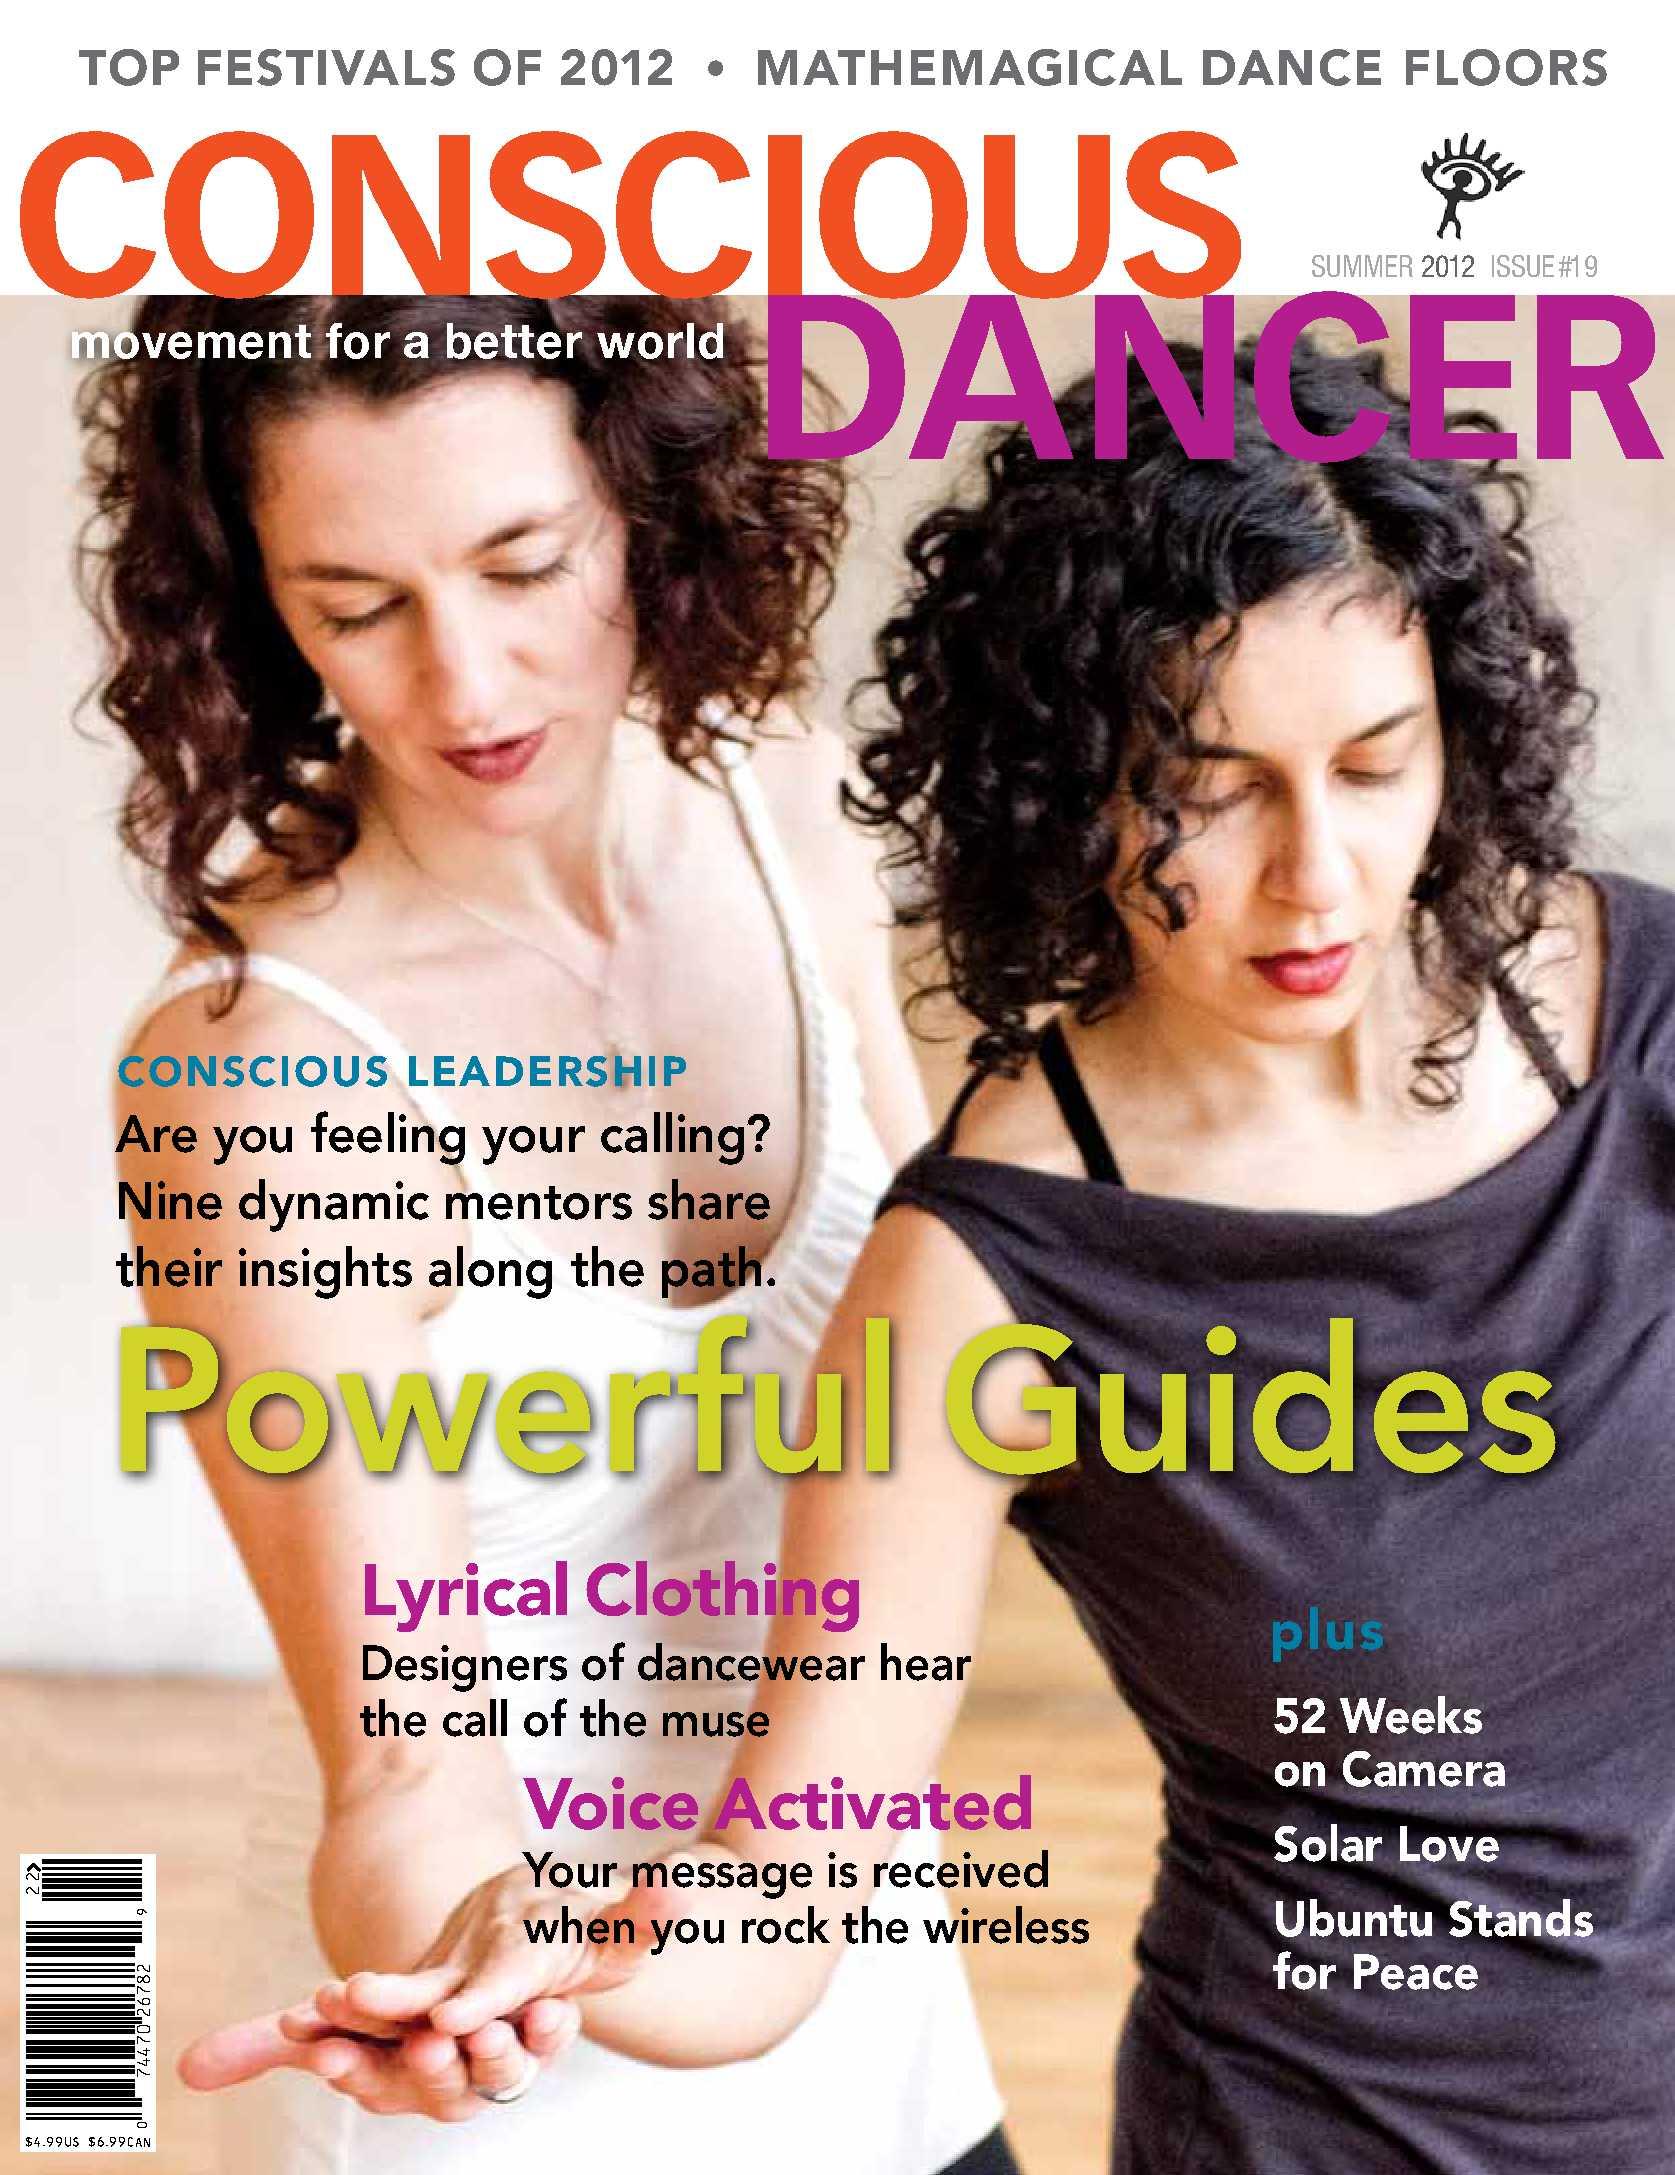 Conscious Dancer Articles_1.jpg